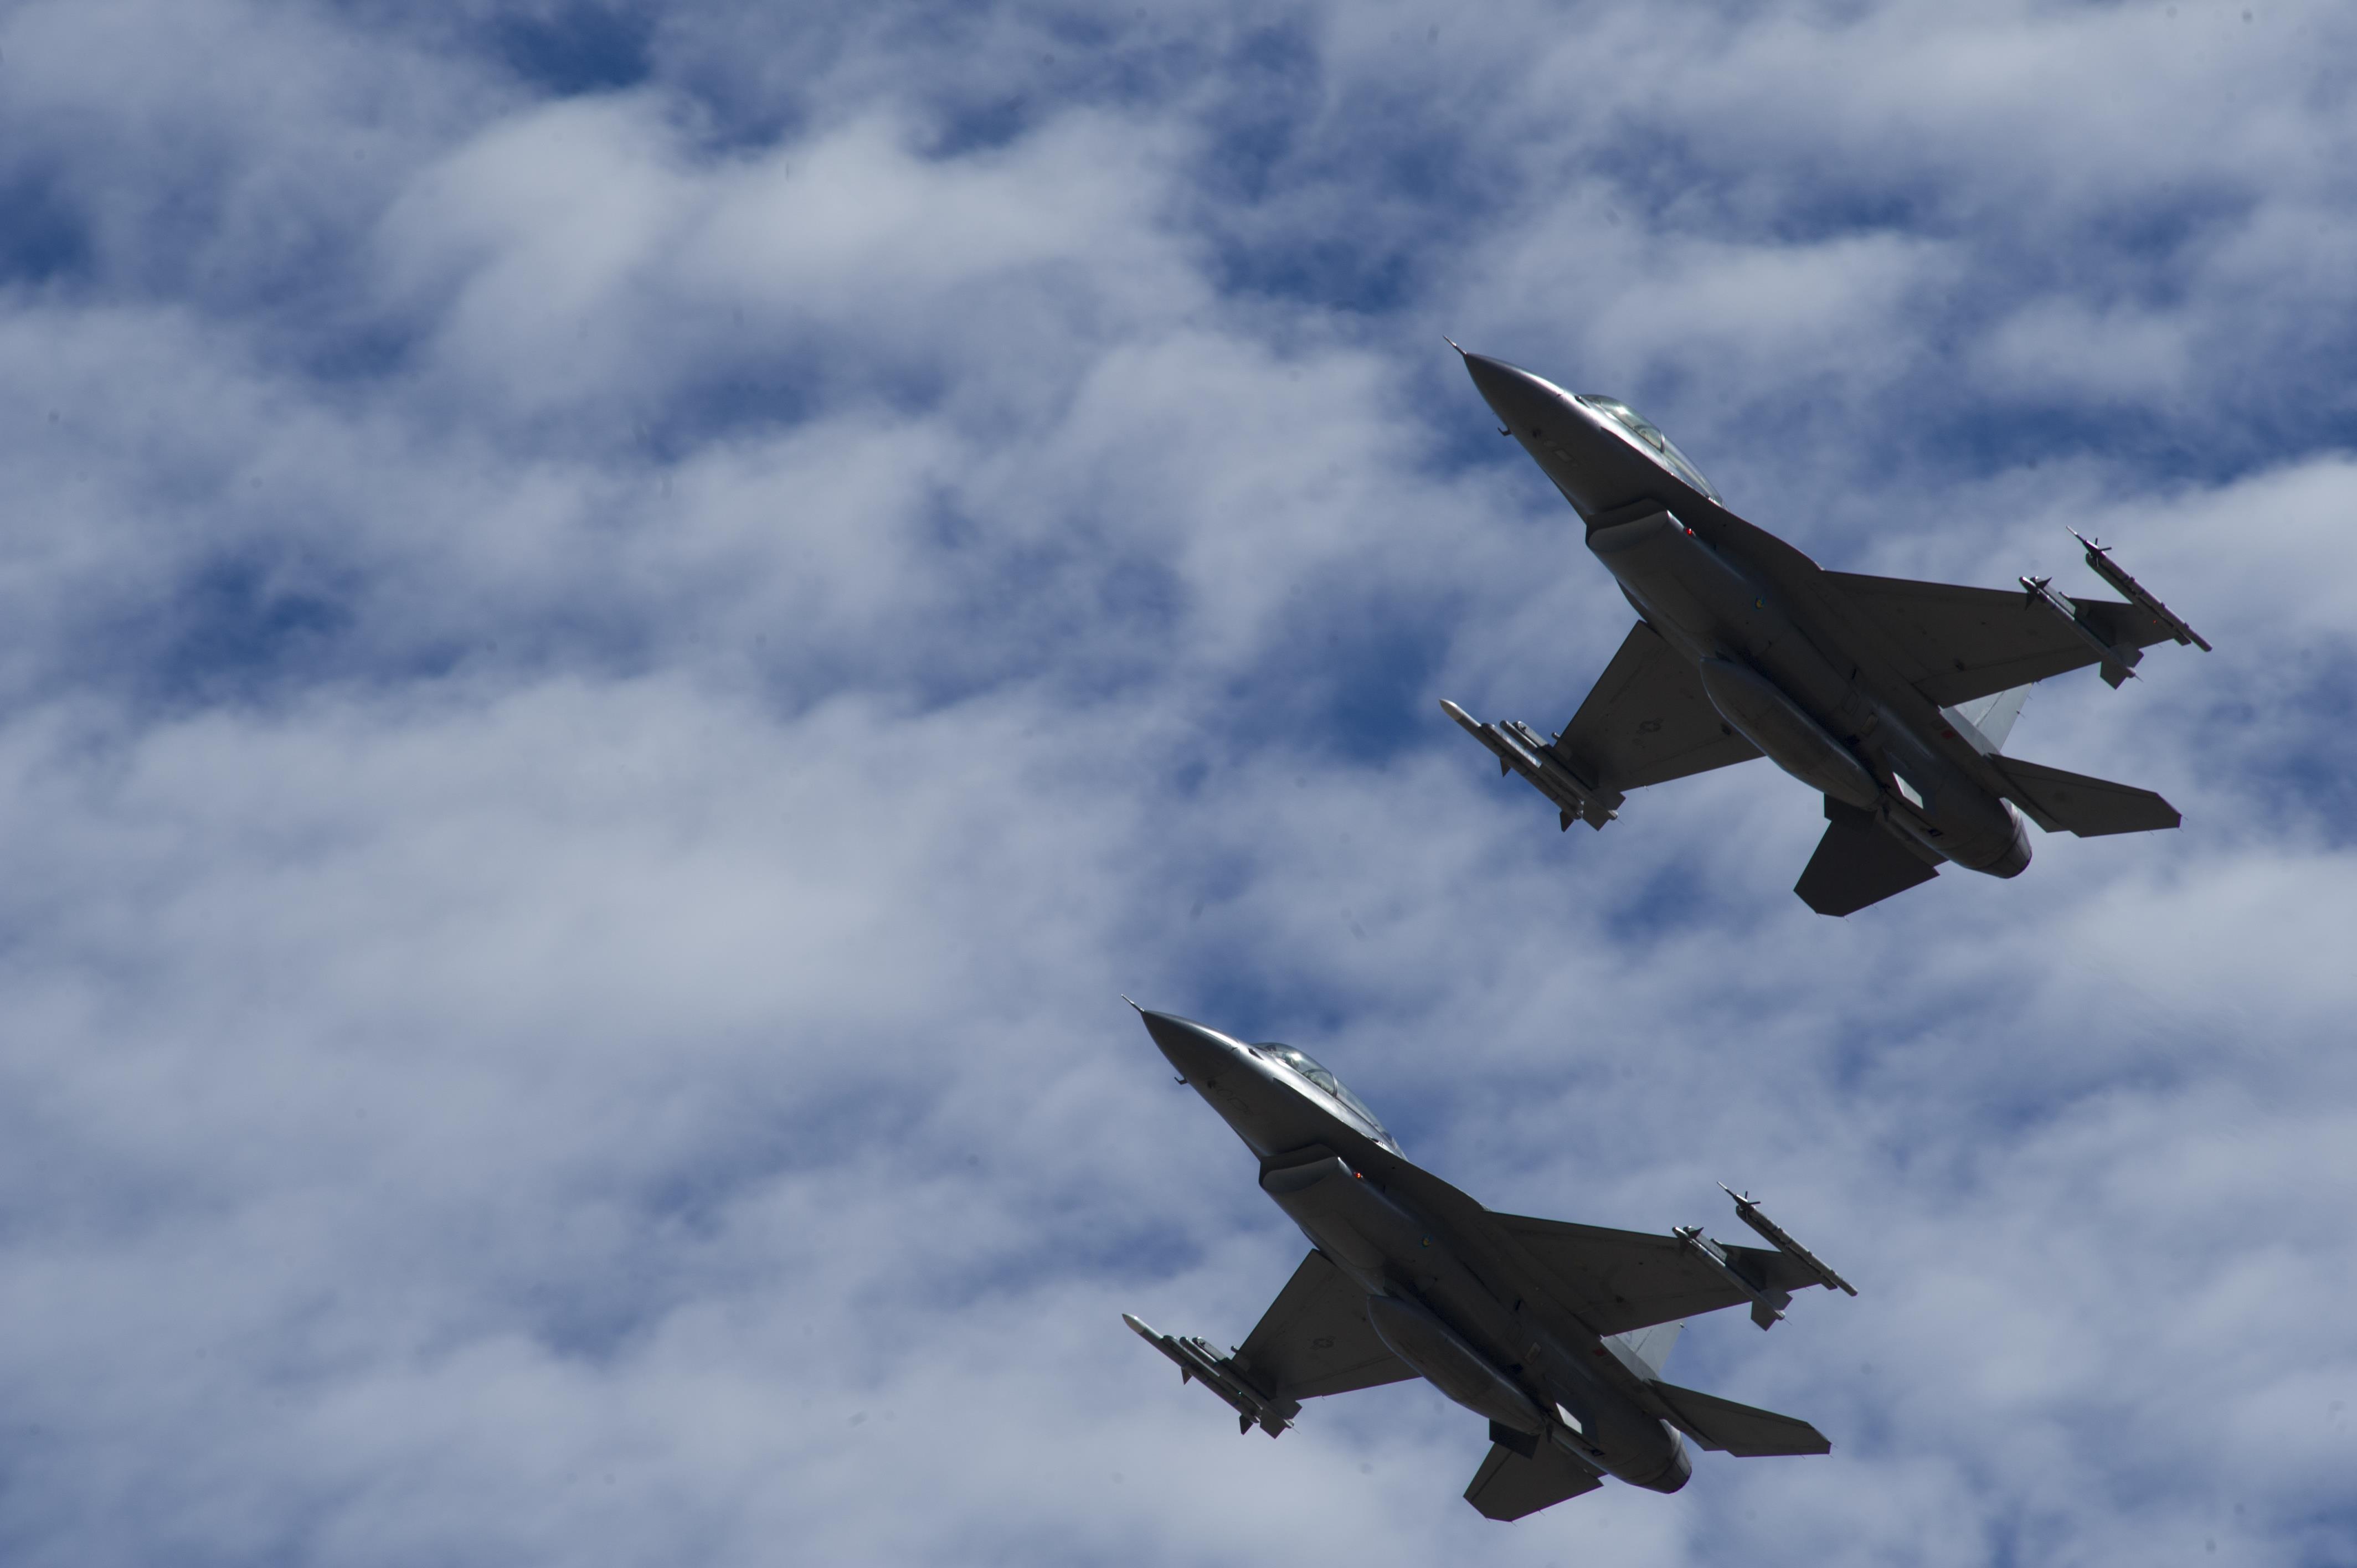 F-4 pilot, MiG-21 Destroyer visits Holloman, tells story